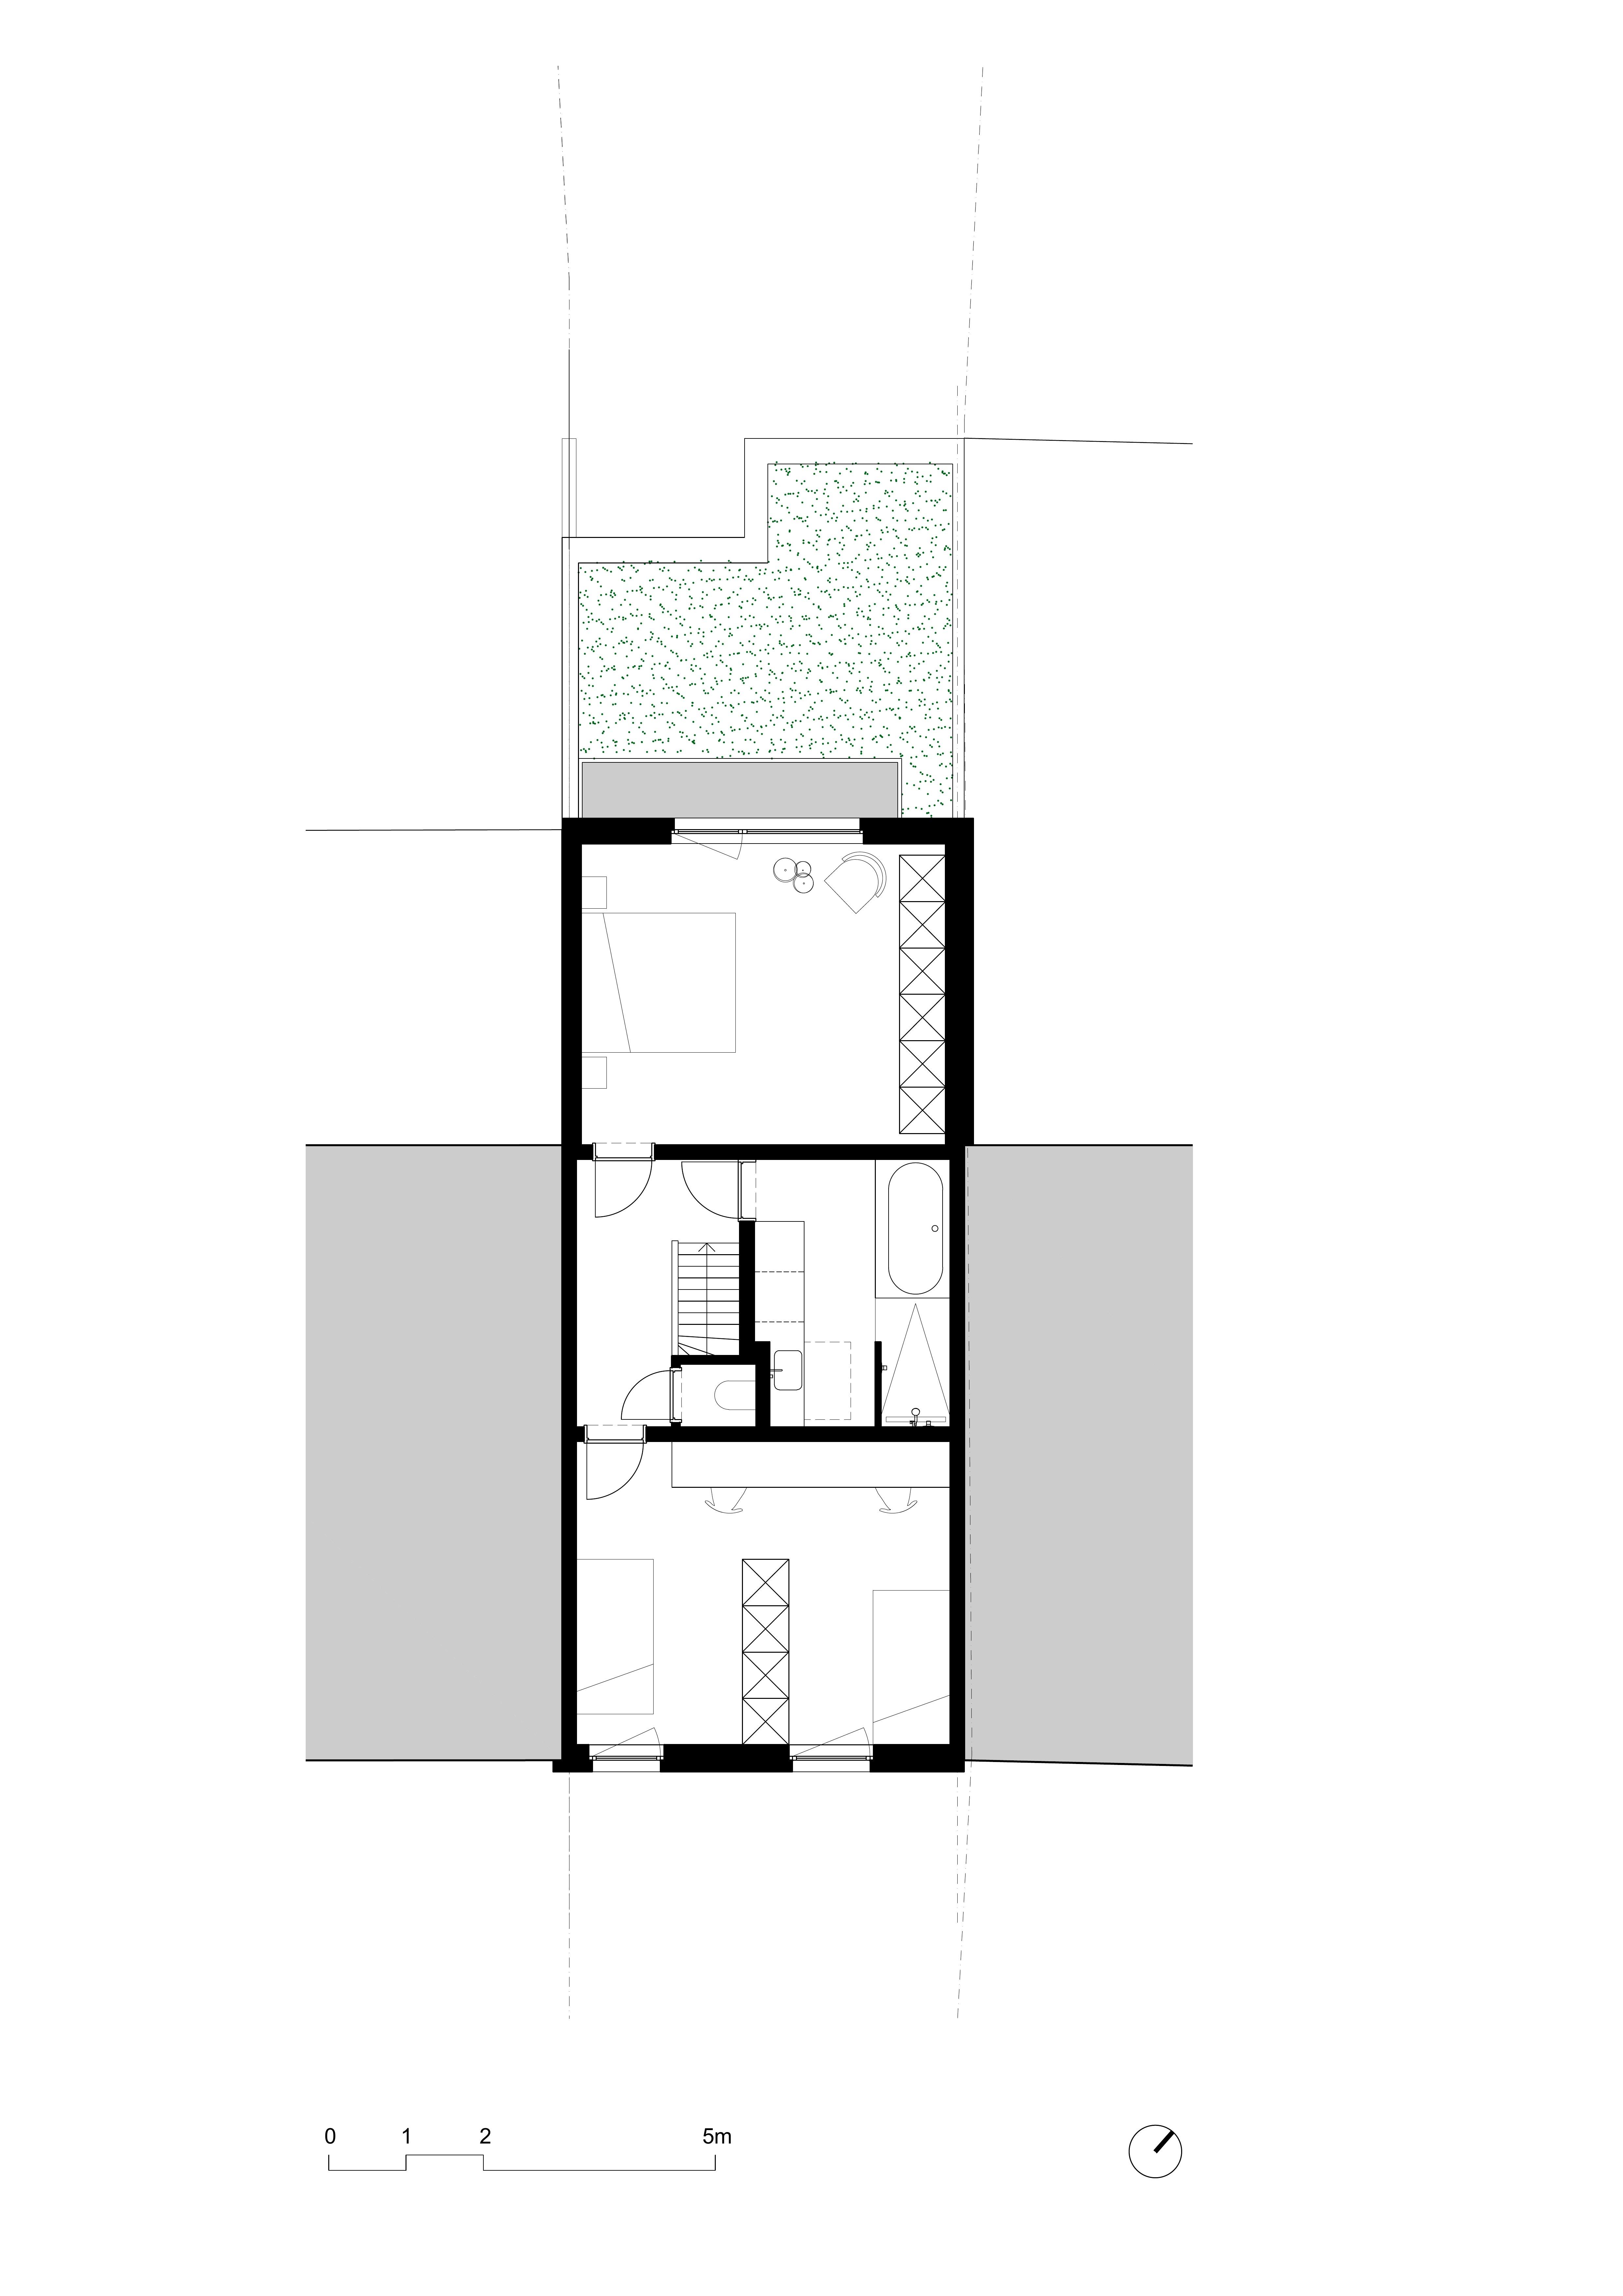 aktordertig - keizershoek - kontich- architectuur - renovatie - bio-ecologisch - interieur